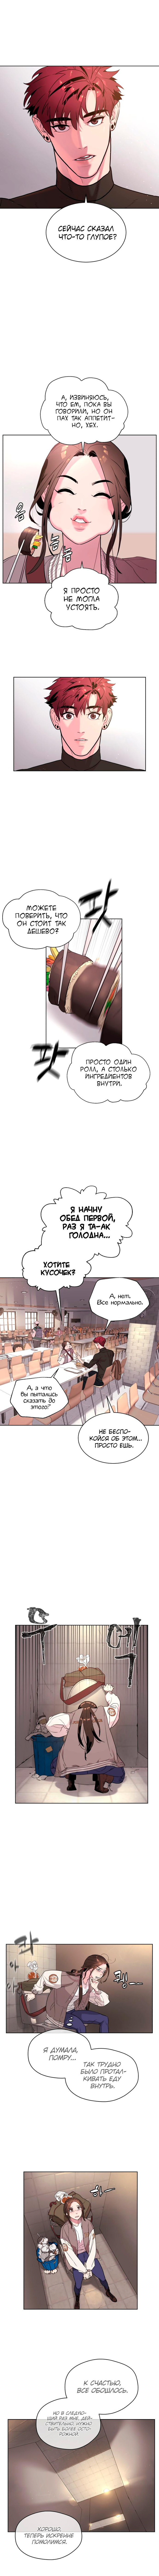 Манга Белая кровь / White Blood  - Том 1 Глава 5 Страница 3